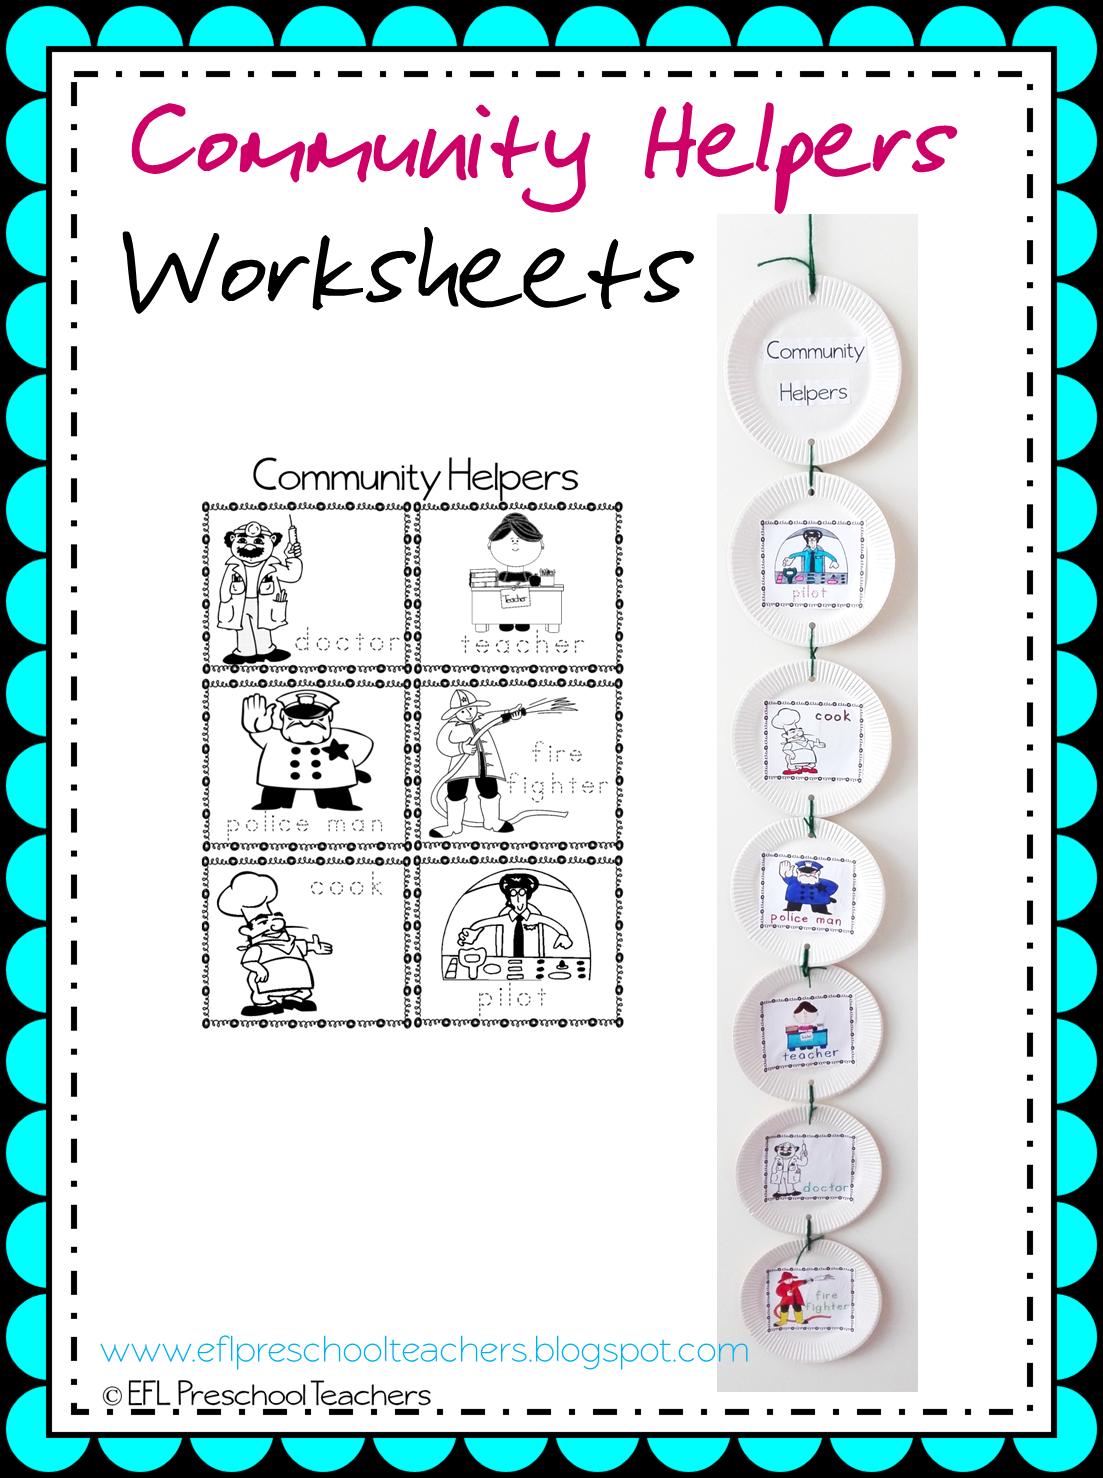 Imagen2 282 29 Png 1 103 1 478 Pixels Community Helpers Worksheets Community Helpers Community Helpers Unit [ 1478 x 1103 Pixel ]